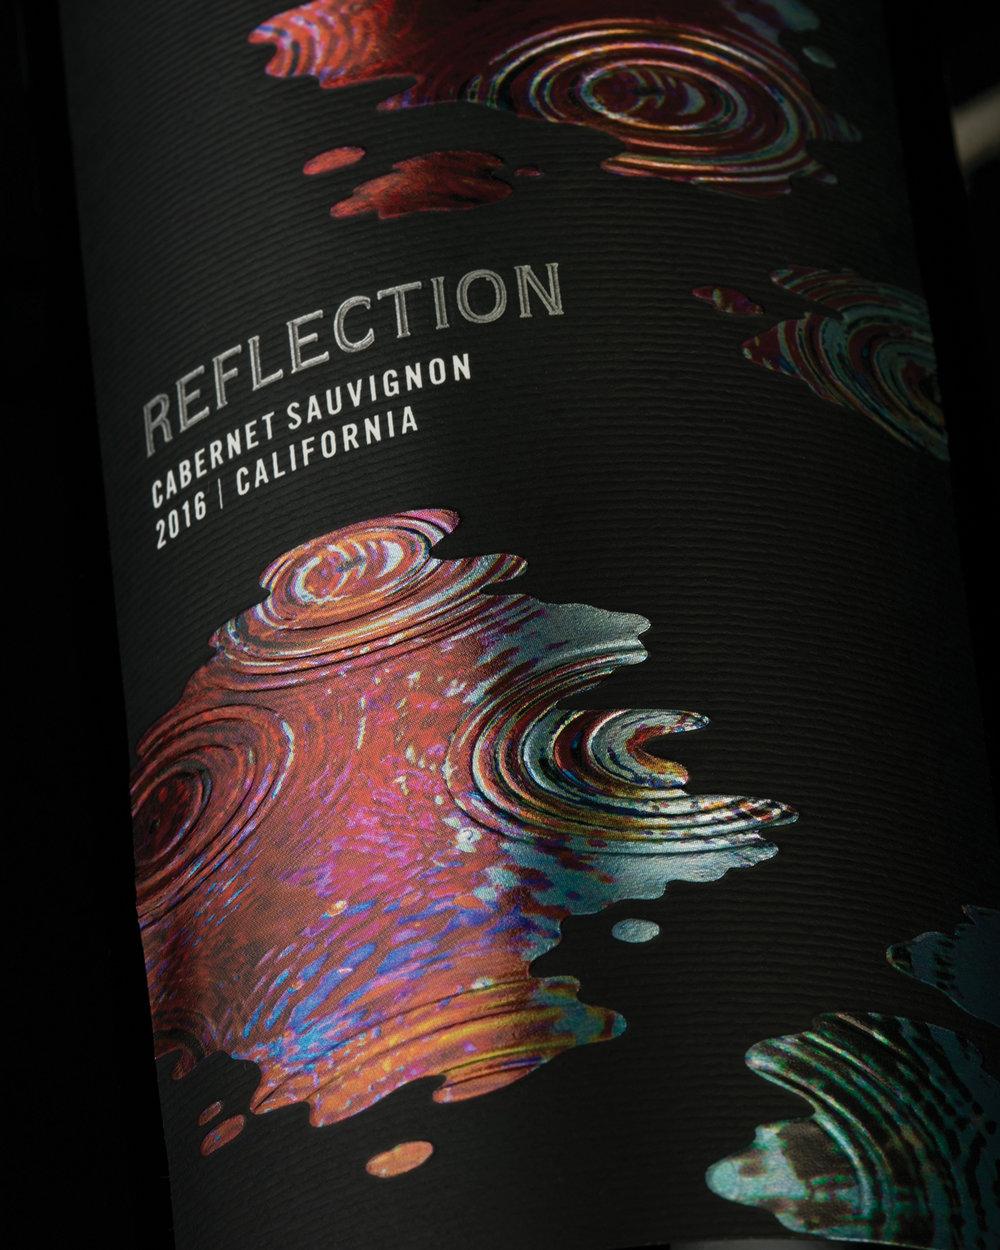 reflection_wine_black_closeup2_sterling_creativeworks.jpg